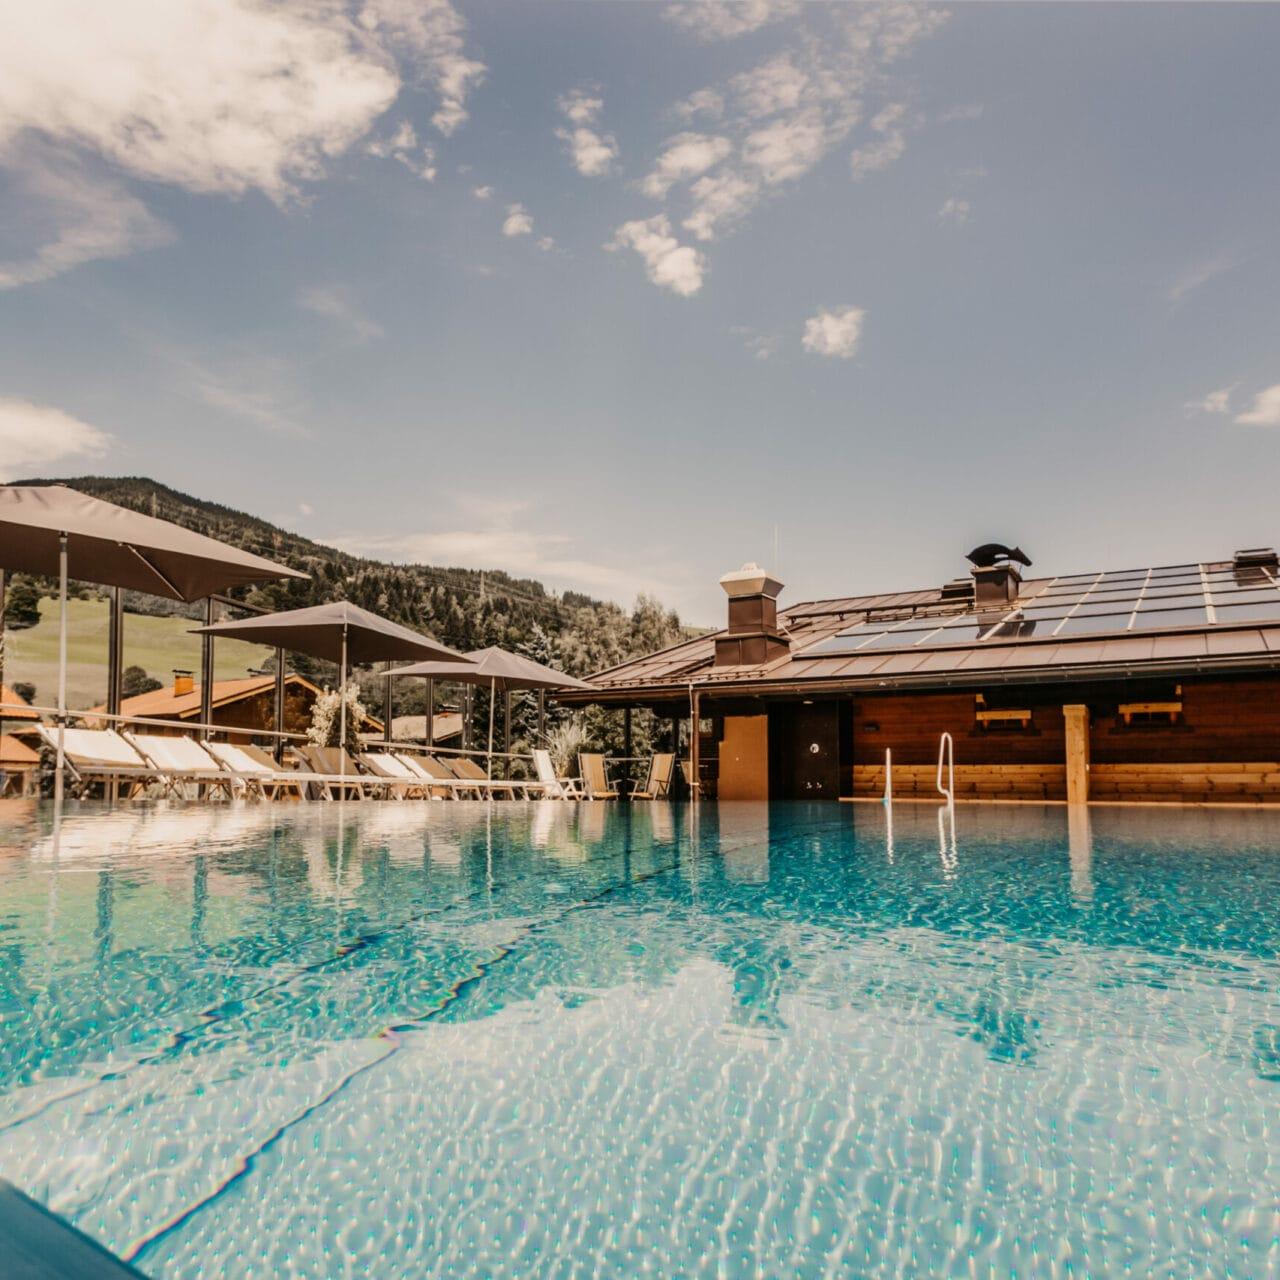 Hofgut-apartment-&-lifestyle-resort-wagrain-familienurlaub-dachterrasse-infinitypool